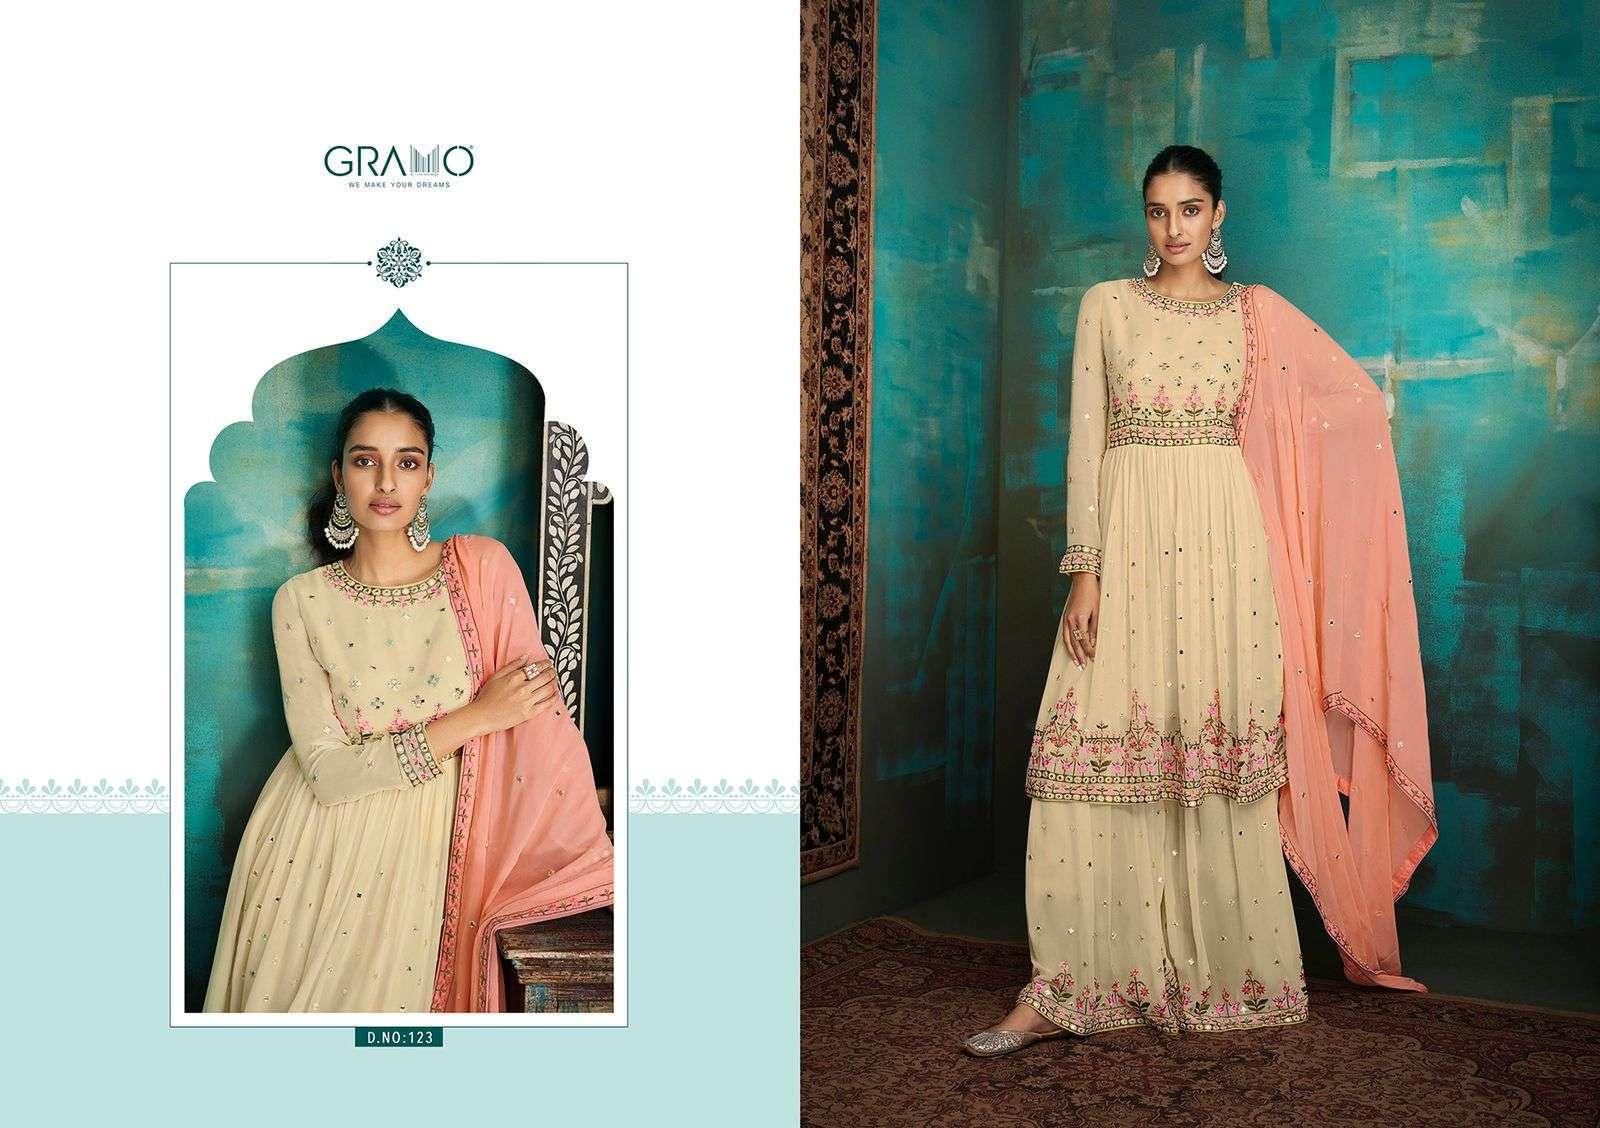 Gramo Navabi Vol 1 Georgette With Heavy Embroidery Work Salwar Kameez Collection 03